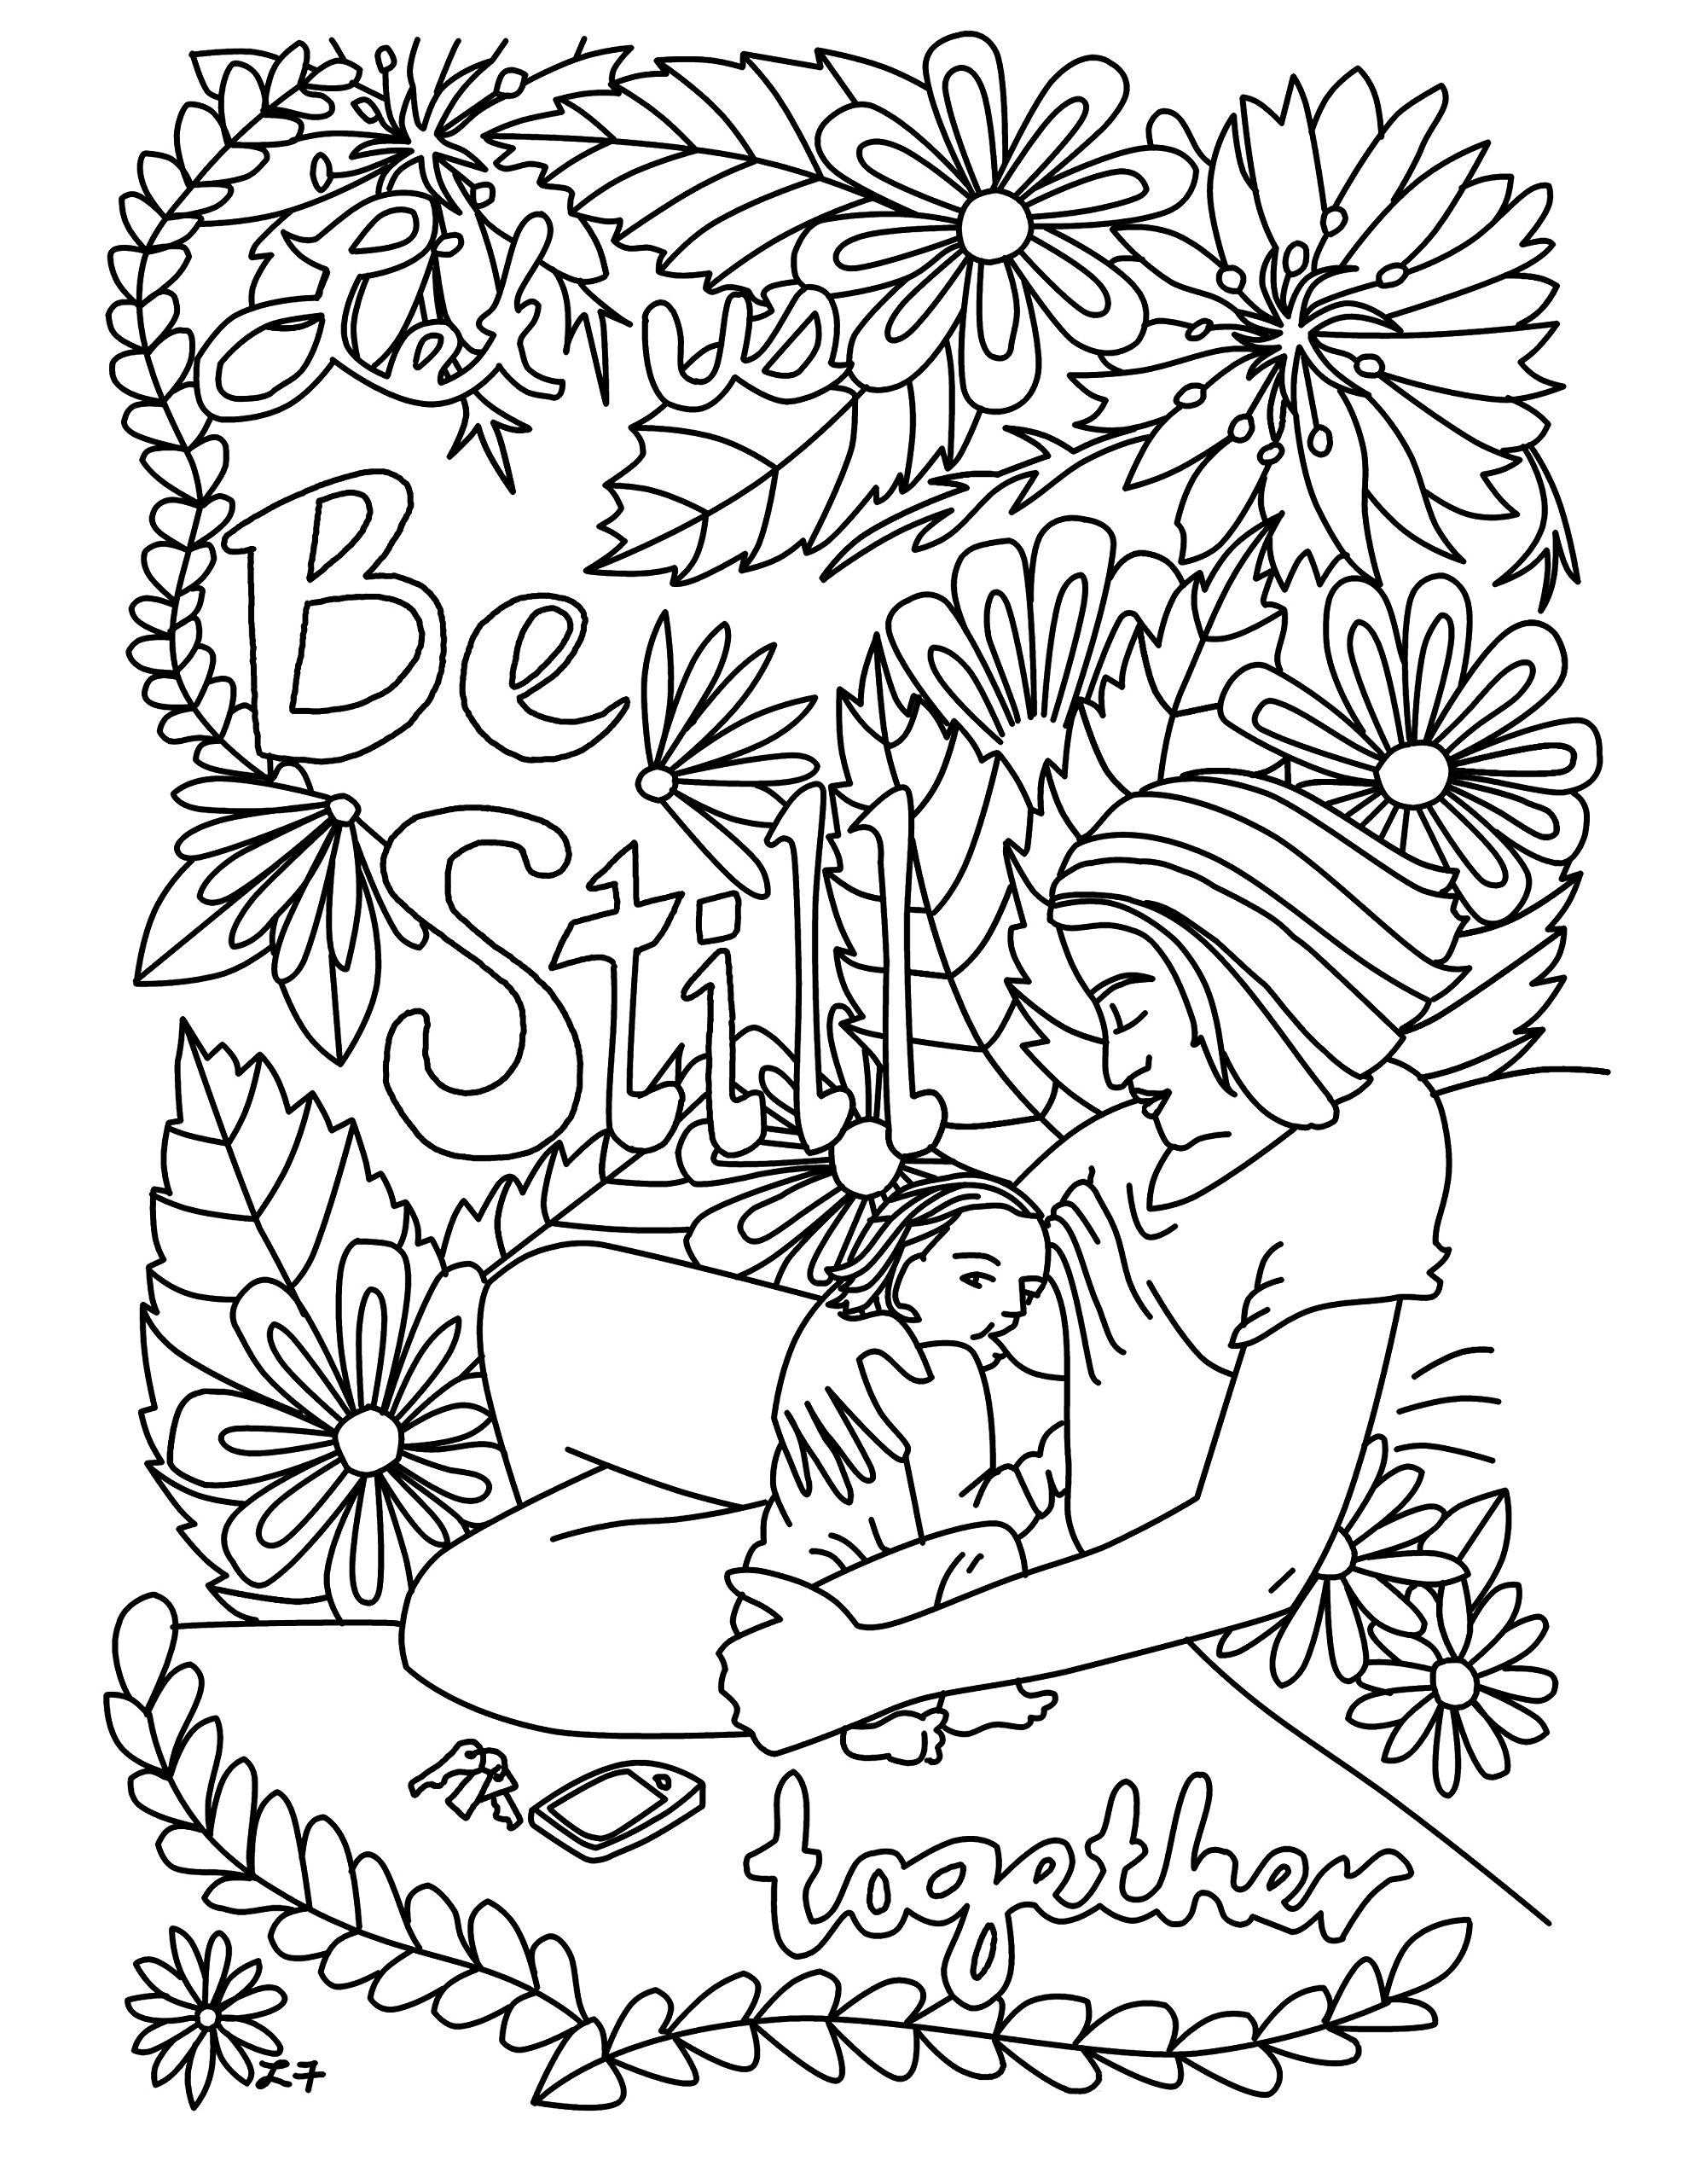 The anatomy coloring book kapit download - Making Milk Lauren Foley Christy Jo Hendricks 9780983184829 Amazon Com Books